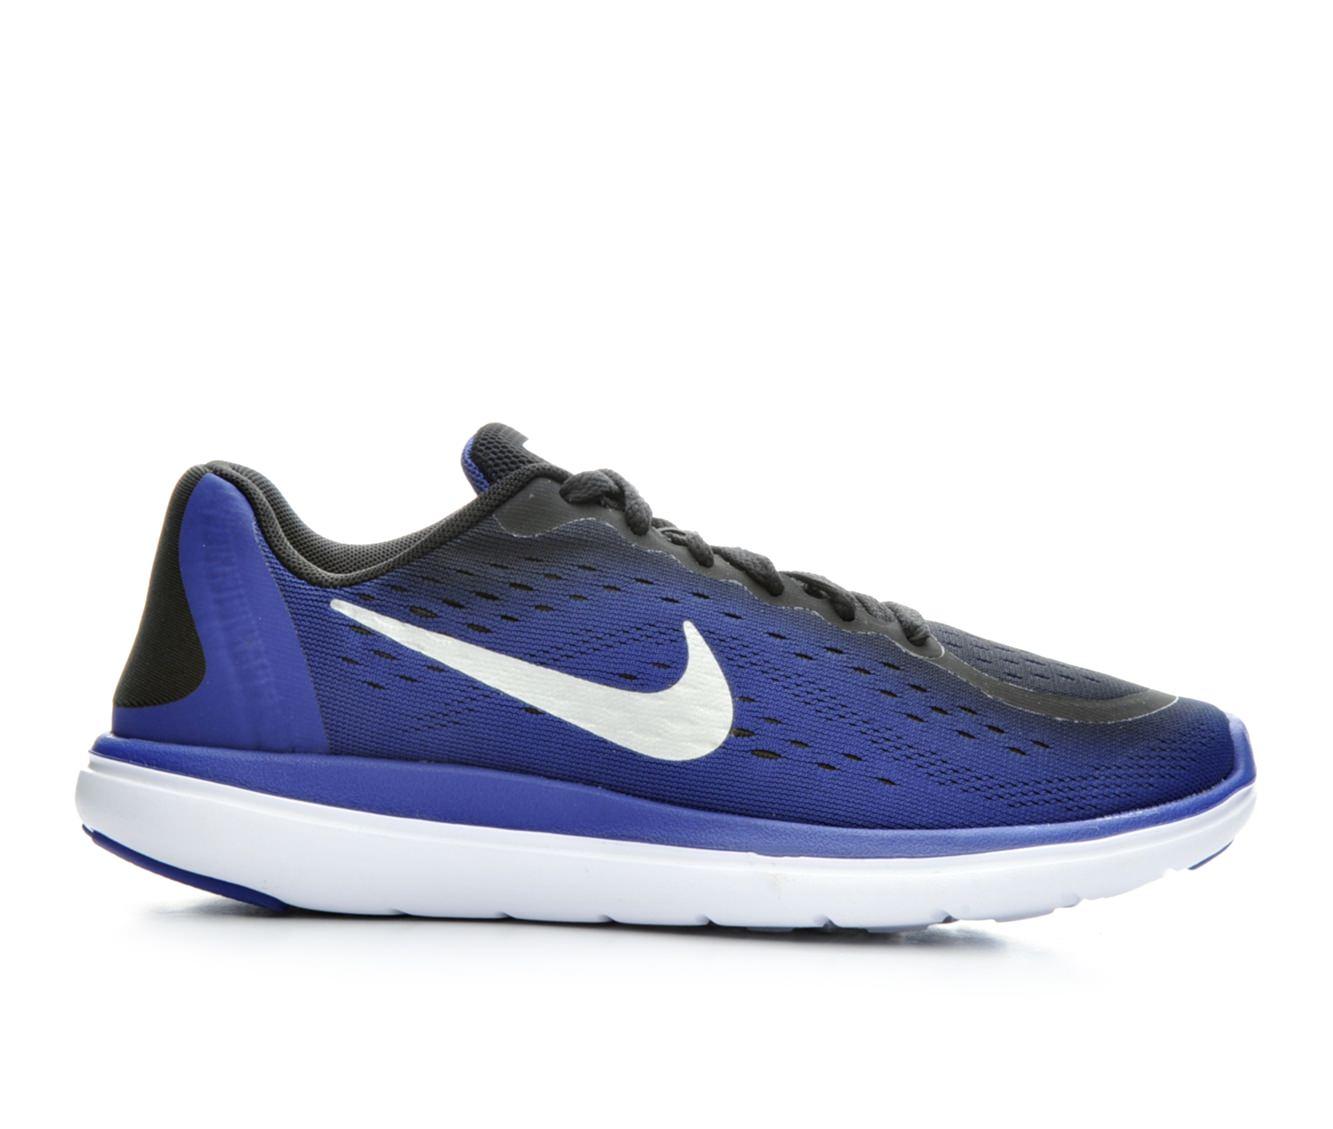 Boys' Nike Flex Run 2017 Running Shoes (Blue)